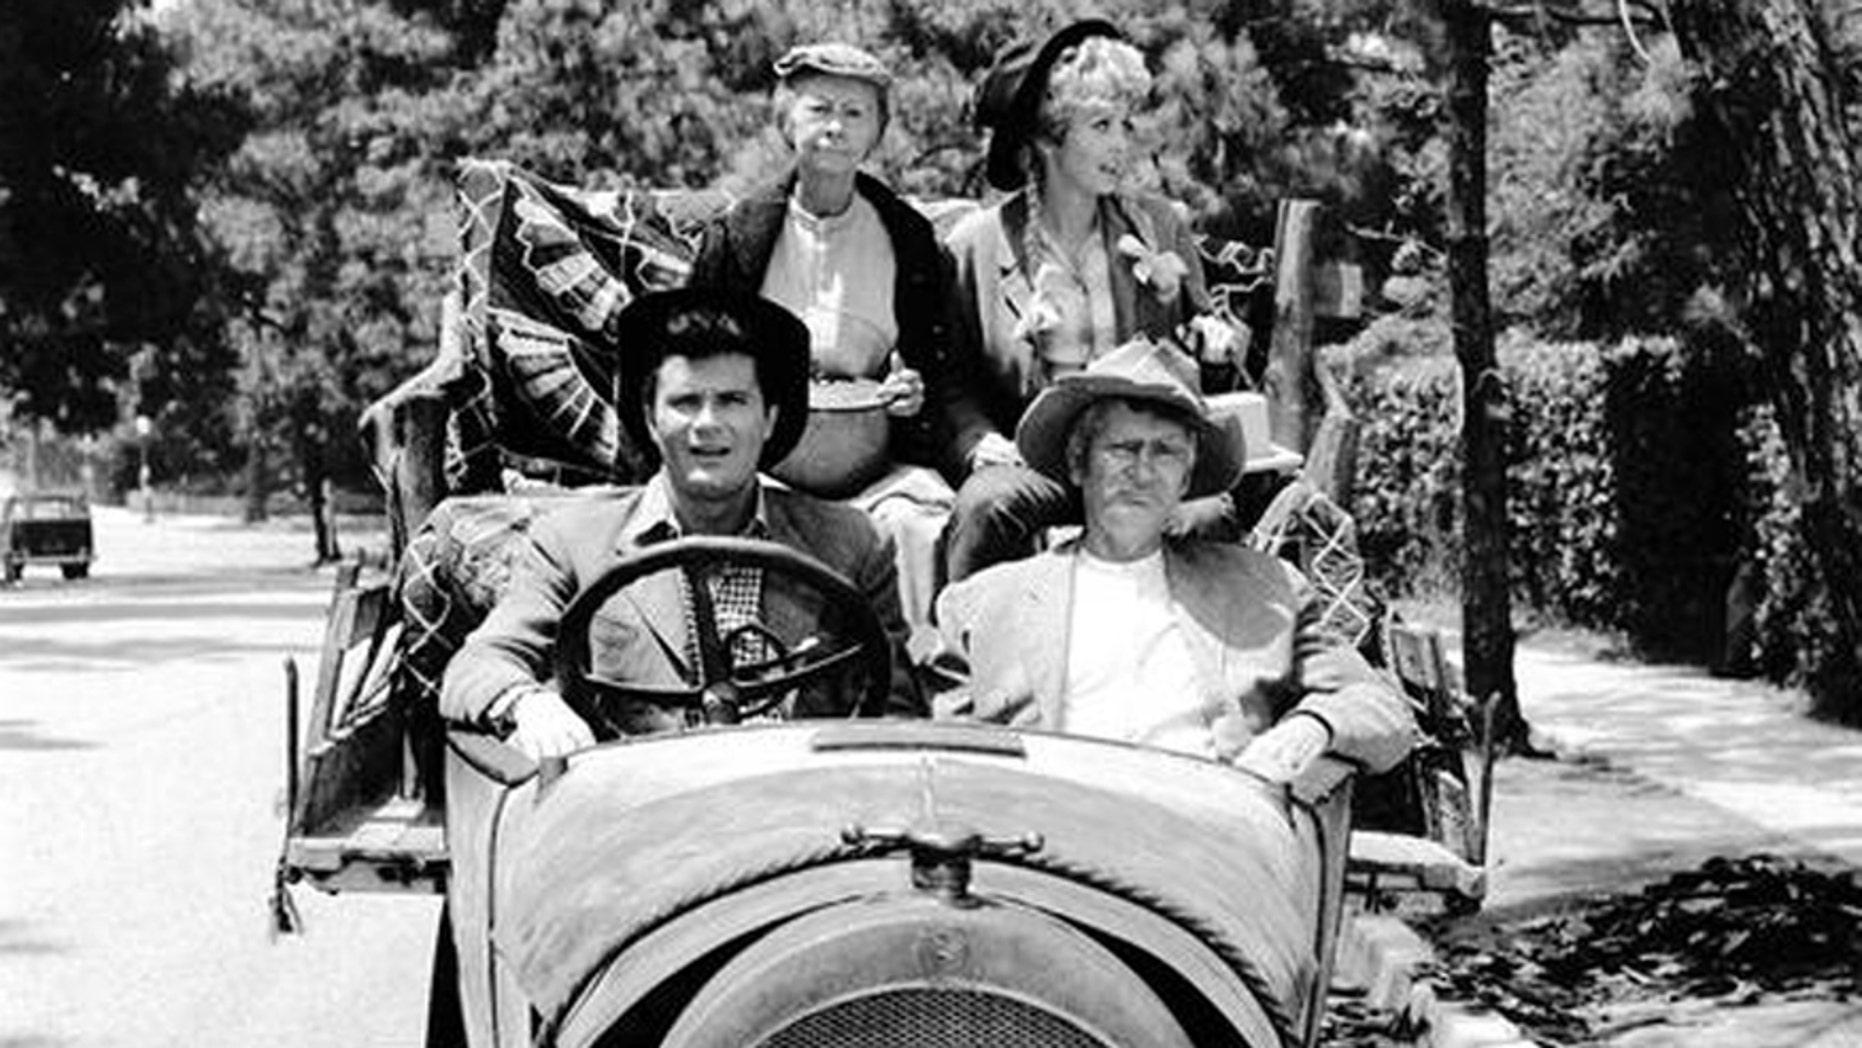 Beverly Hillbillies Star Max Baer Suing Cbs